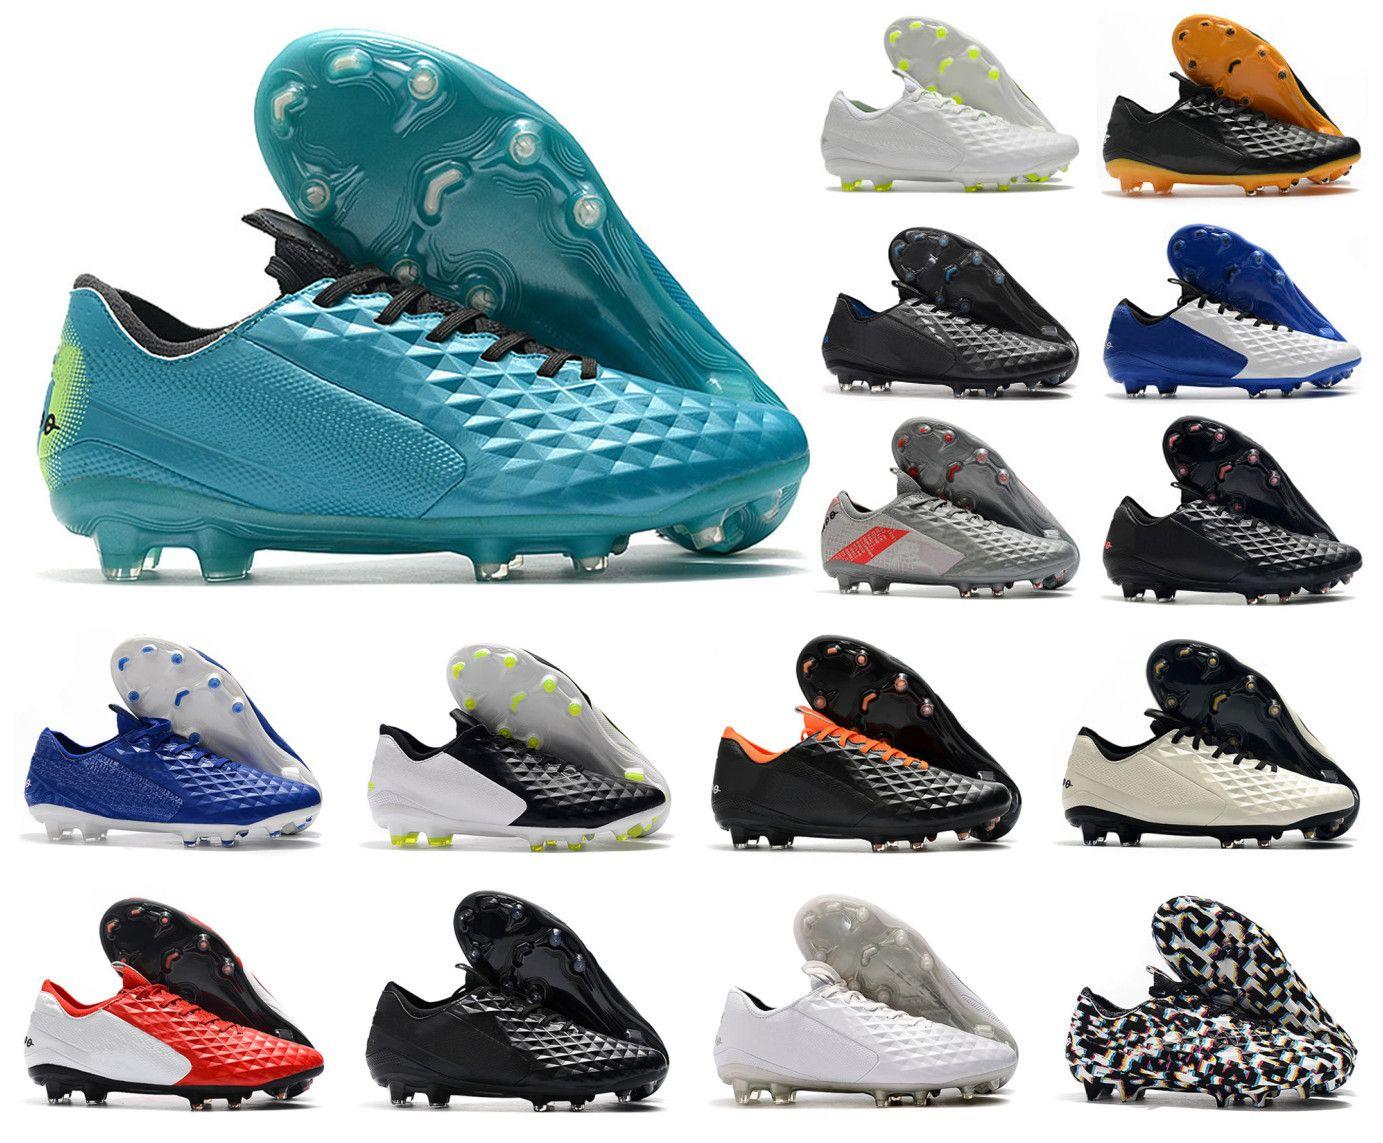 2021 Tiempo Legend VIII 8 Elite FG Football Soccer Shoes Invalse Pack Daybreak Abierhood 8S رجالي منخفض أحذية الكاحل المرابط US6.5-11